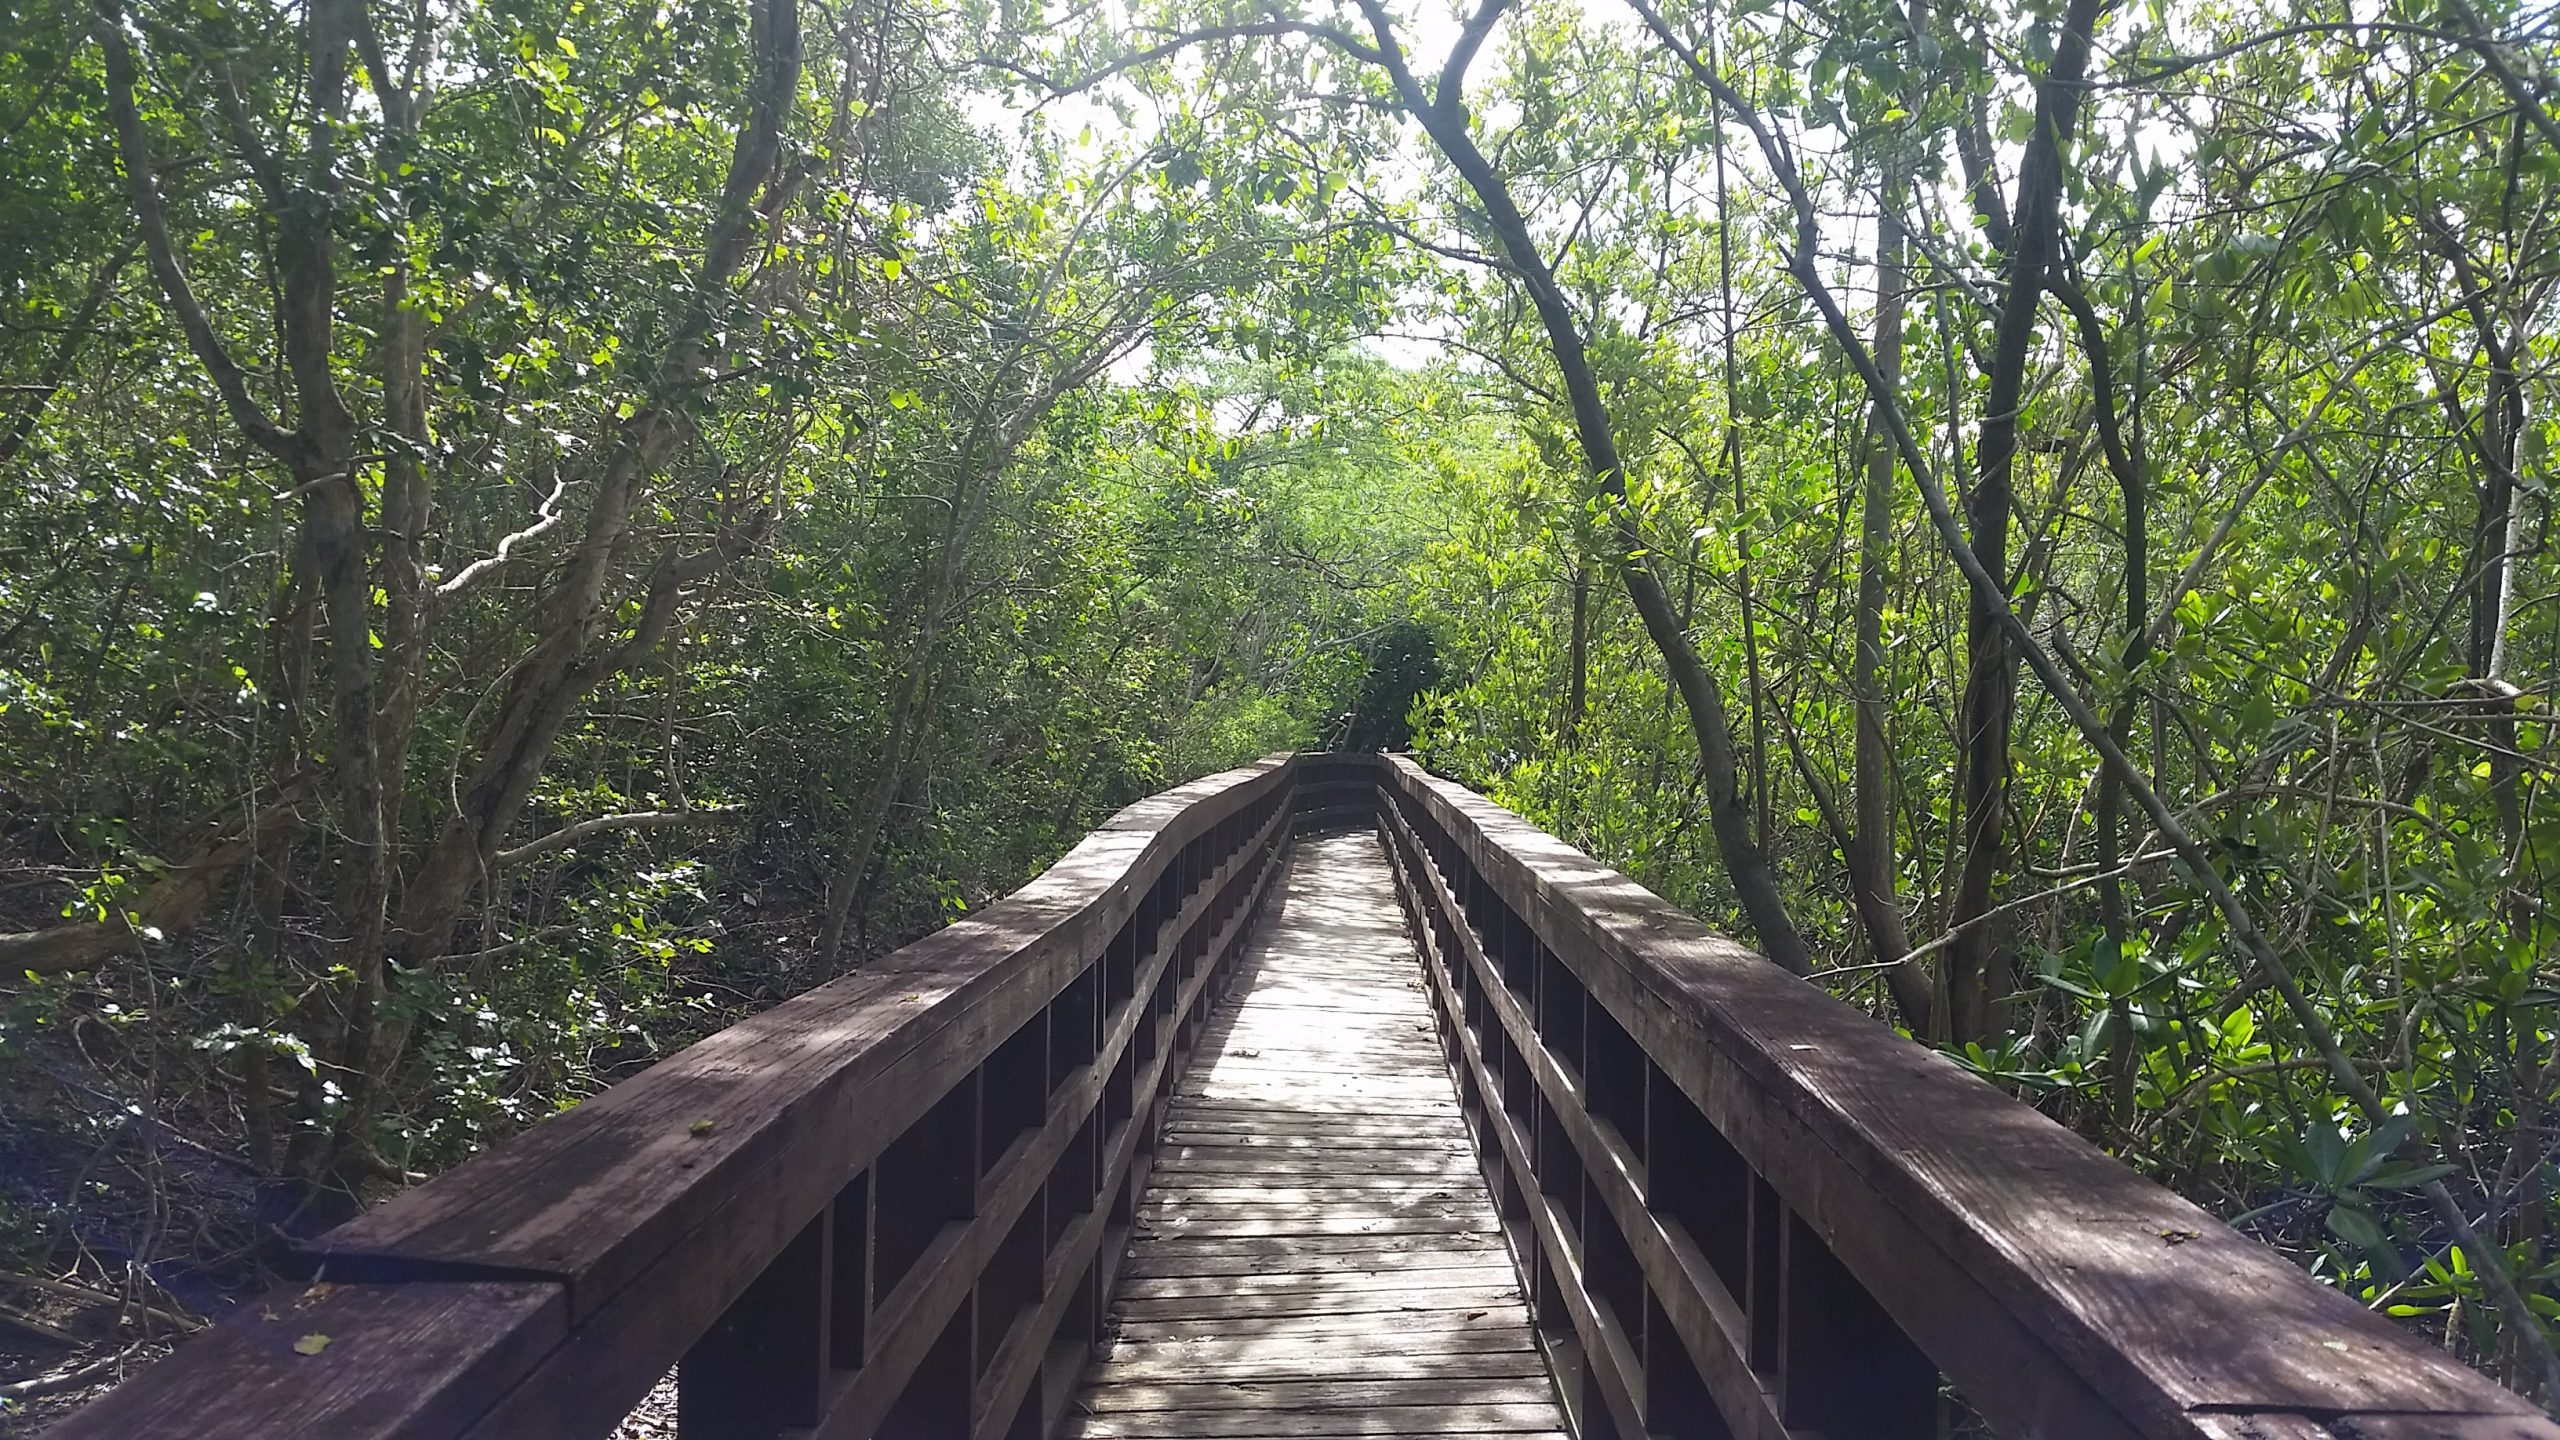 Wooden path through a jungle